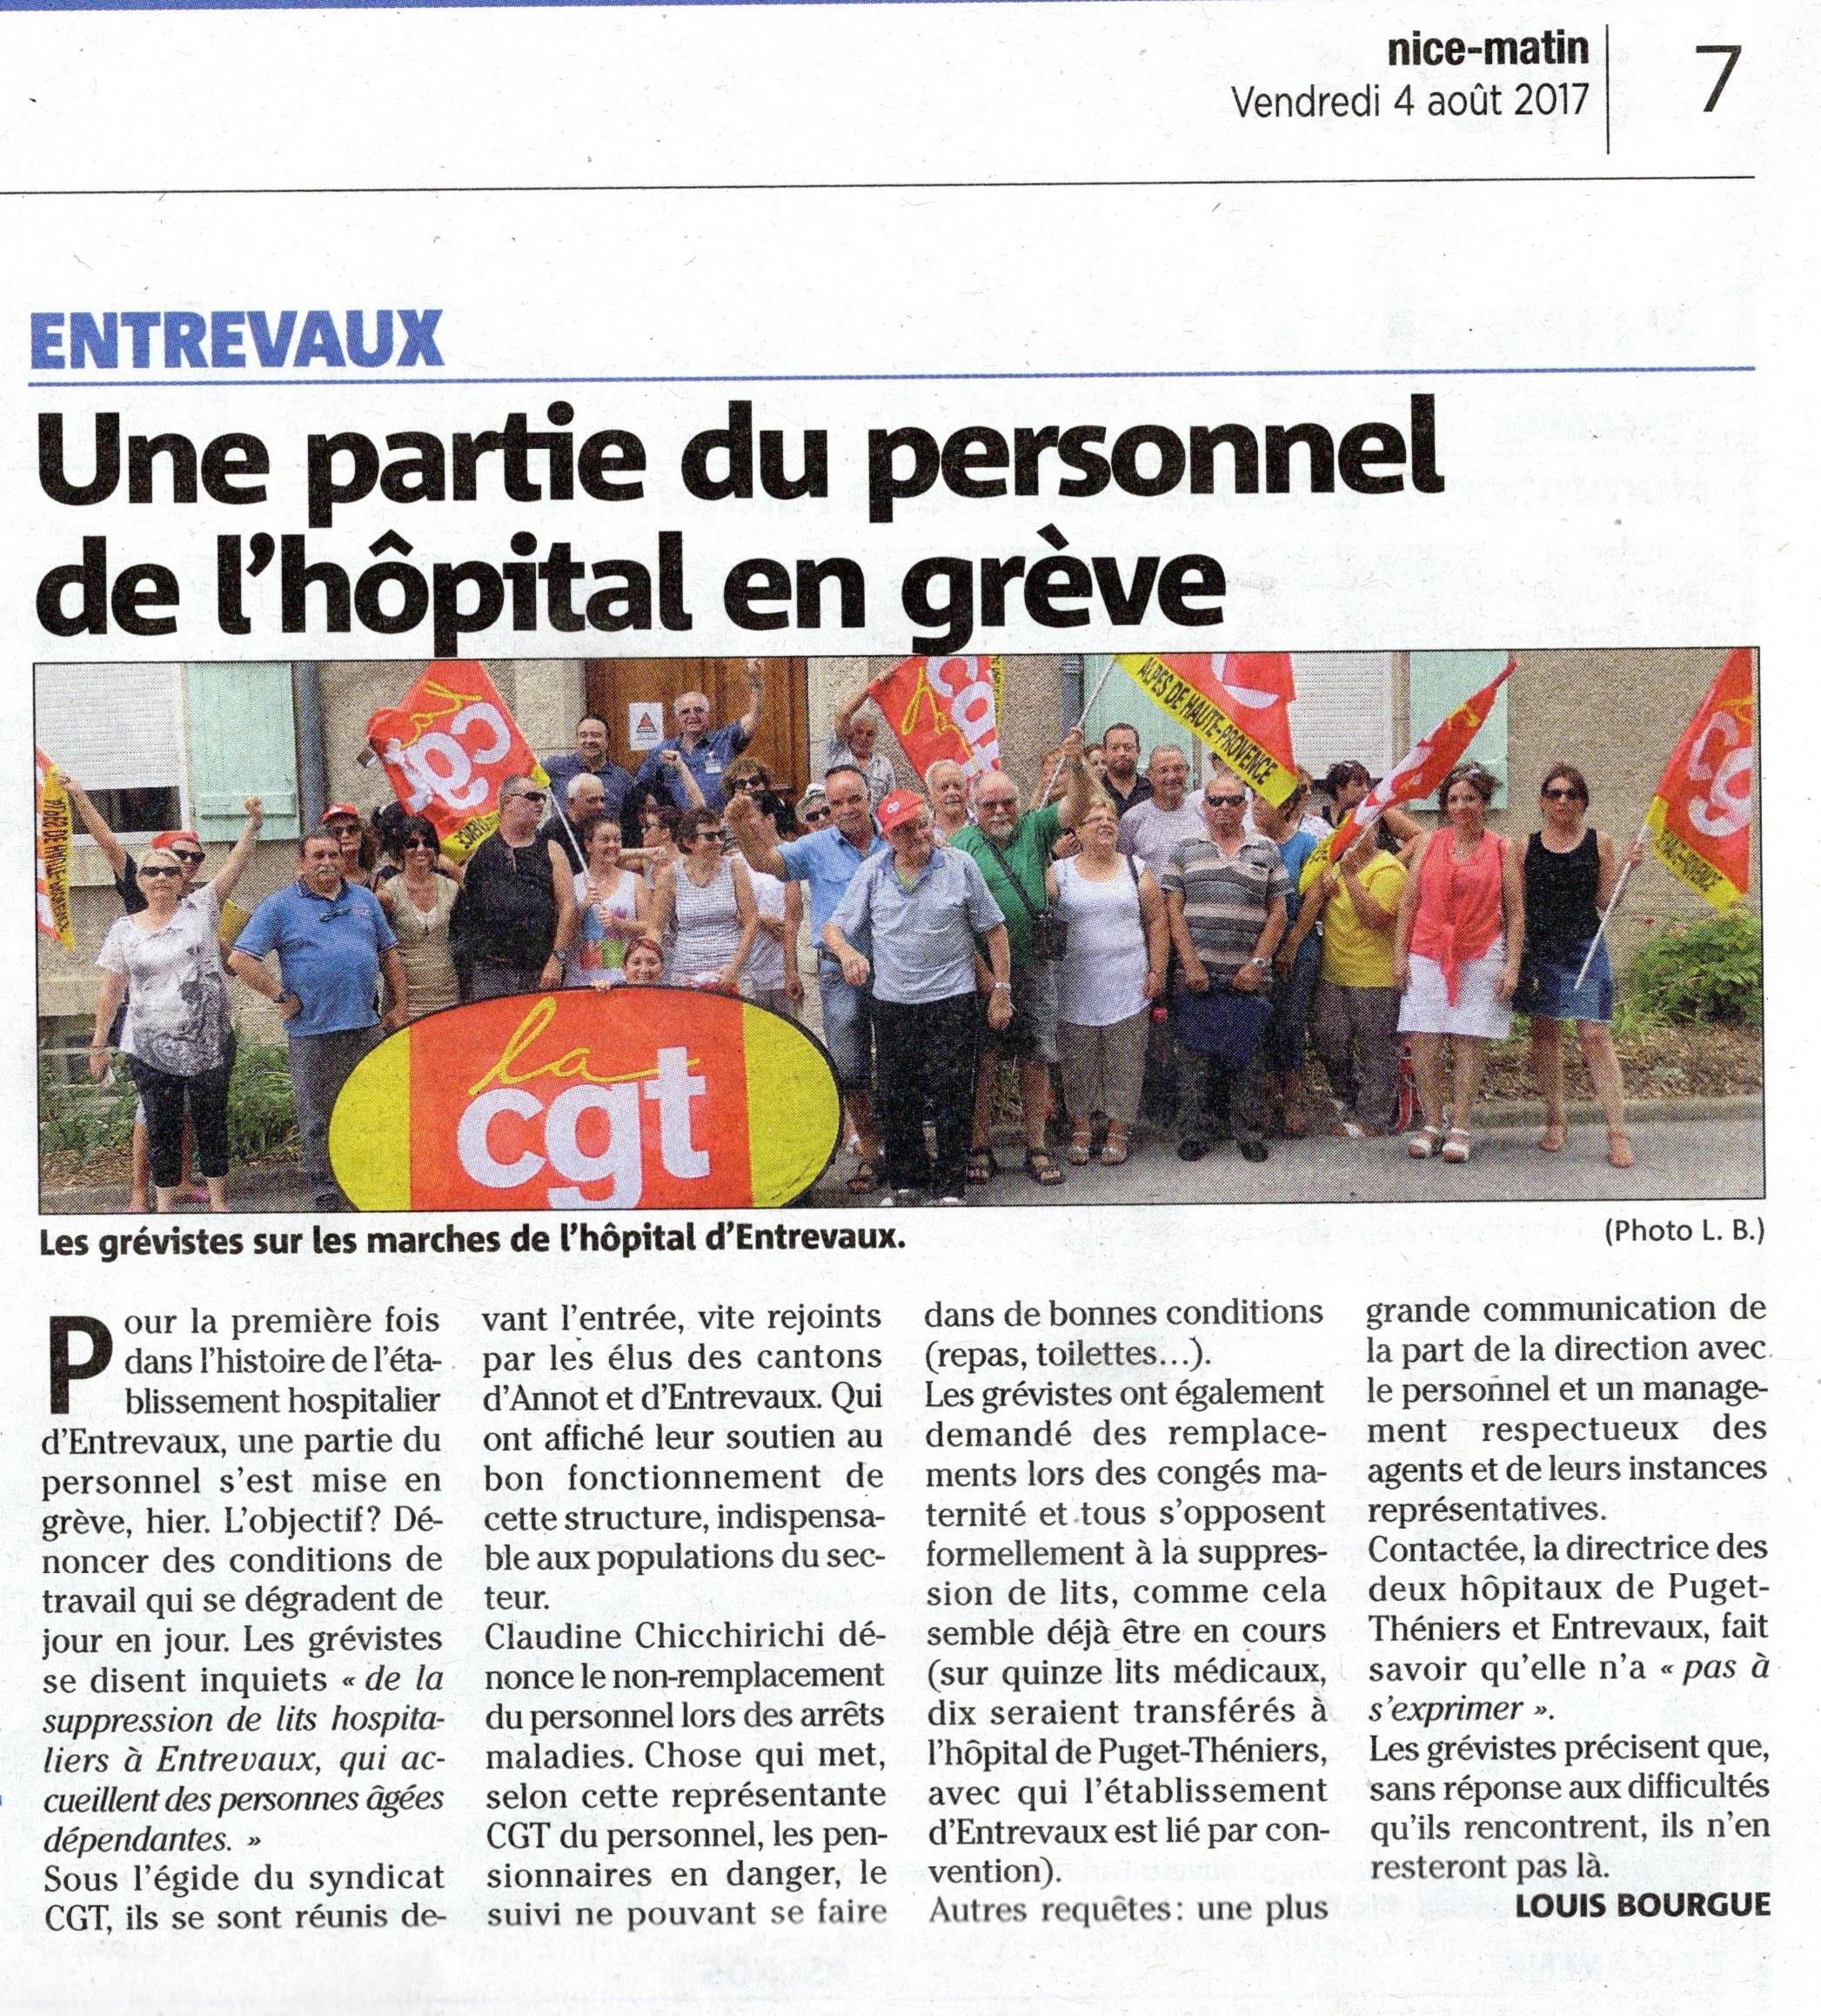 836. Grève Entrevaux Nice Matin 4 août 2017